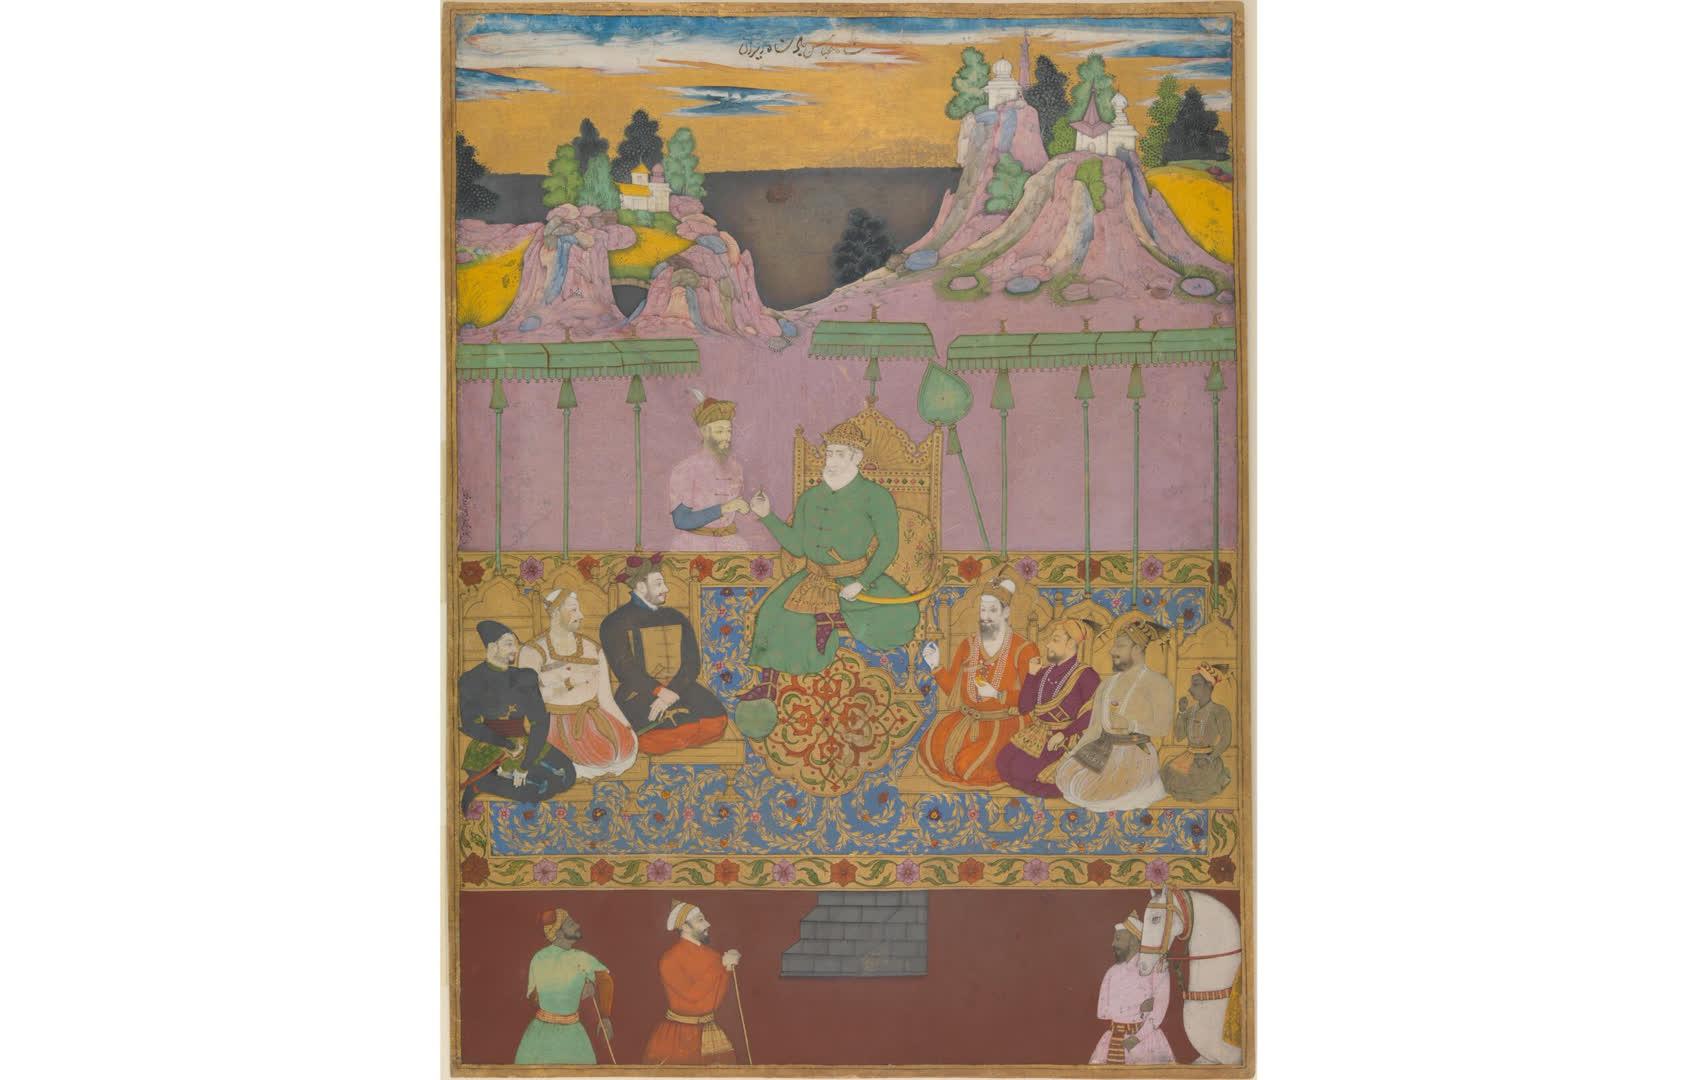 Bijapur's Art – A Melting Pot